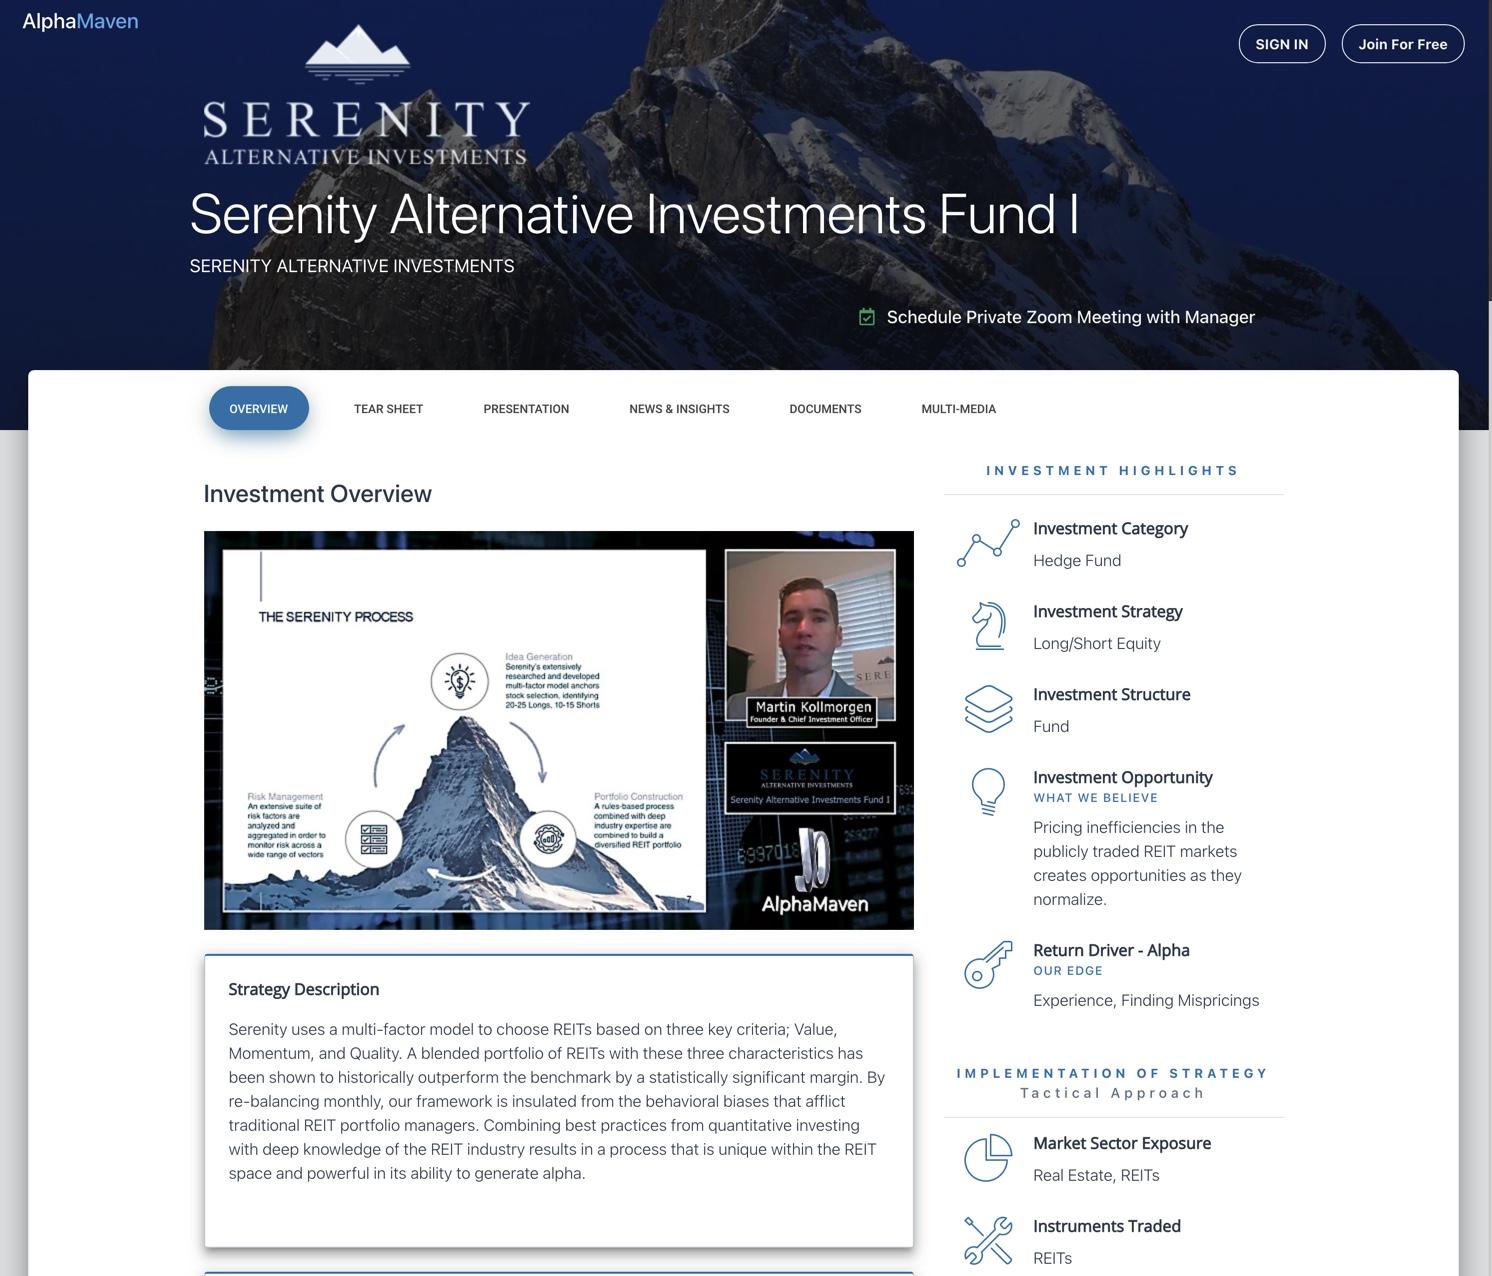 AlphaMaven Hedge Fund Profile